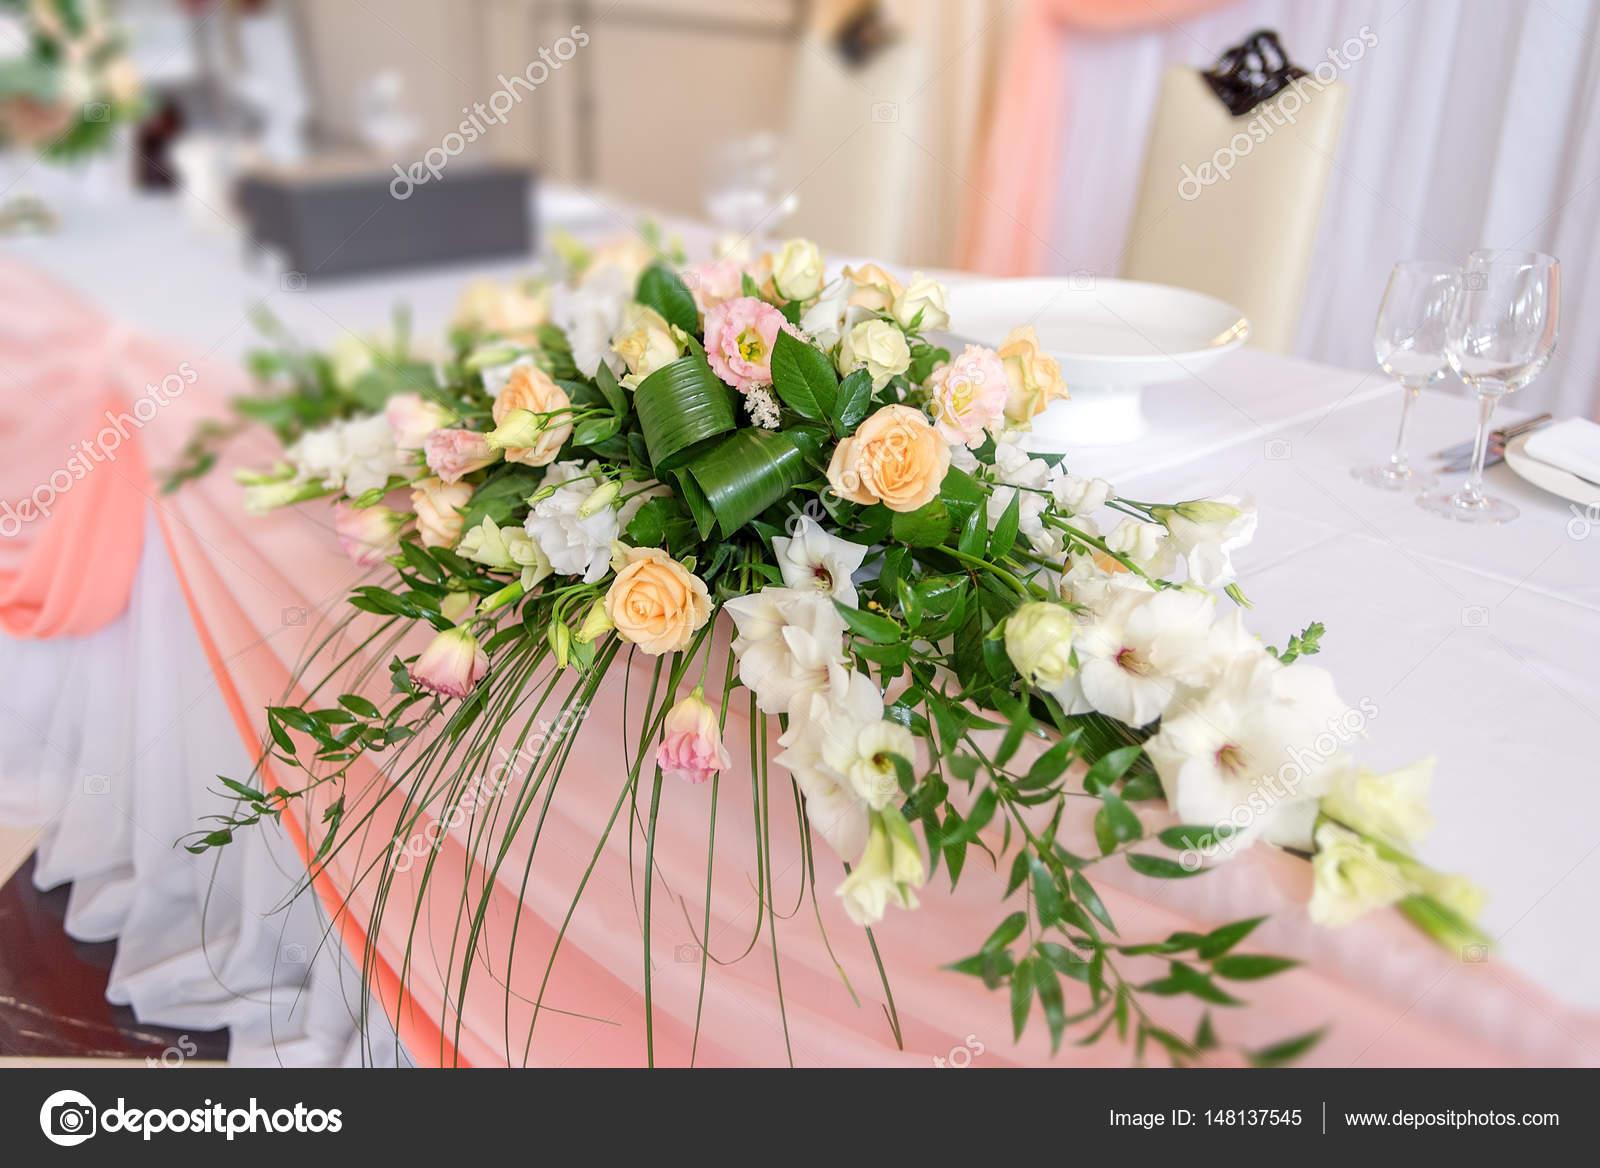 Addobbi Floreali Matrimonio Rustico : Decorazioni floreali matrimonio u2014 foto stock © d duda #148137545